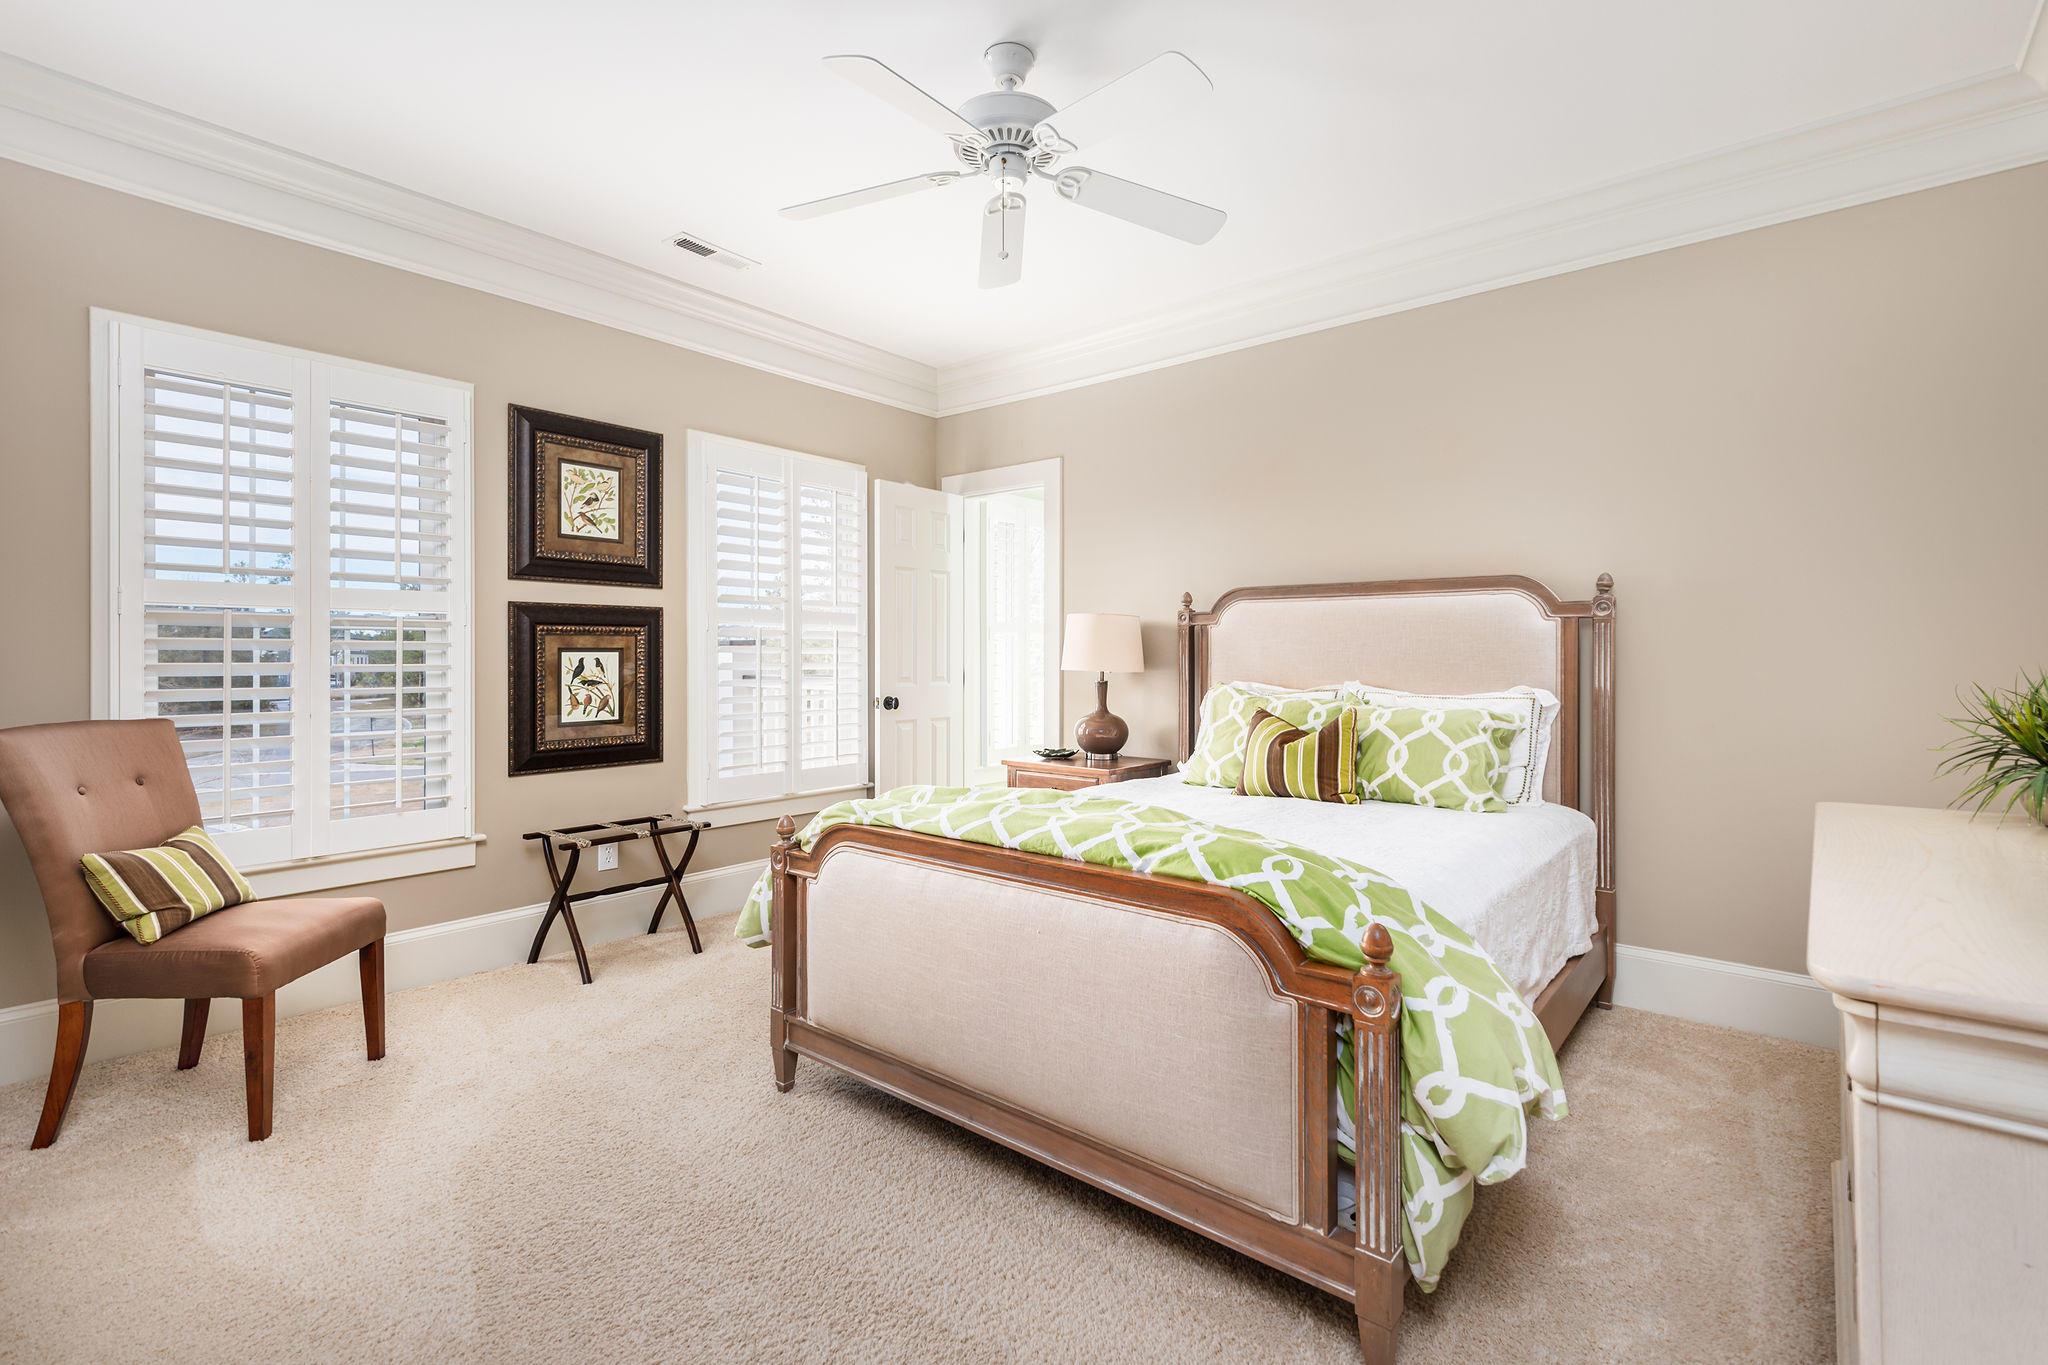 Dunes West Homes For Sale - 1305 King Bird, Mount Pleasant, SC - 5